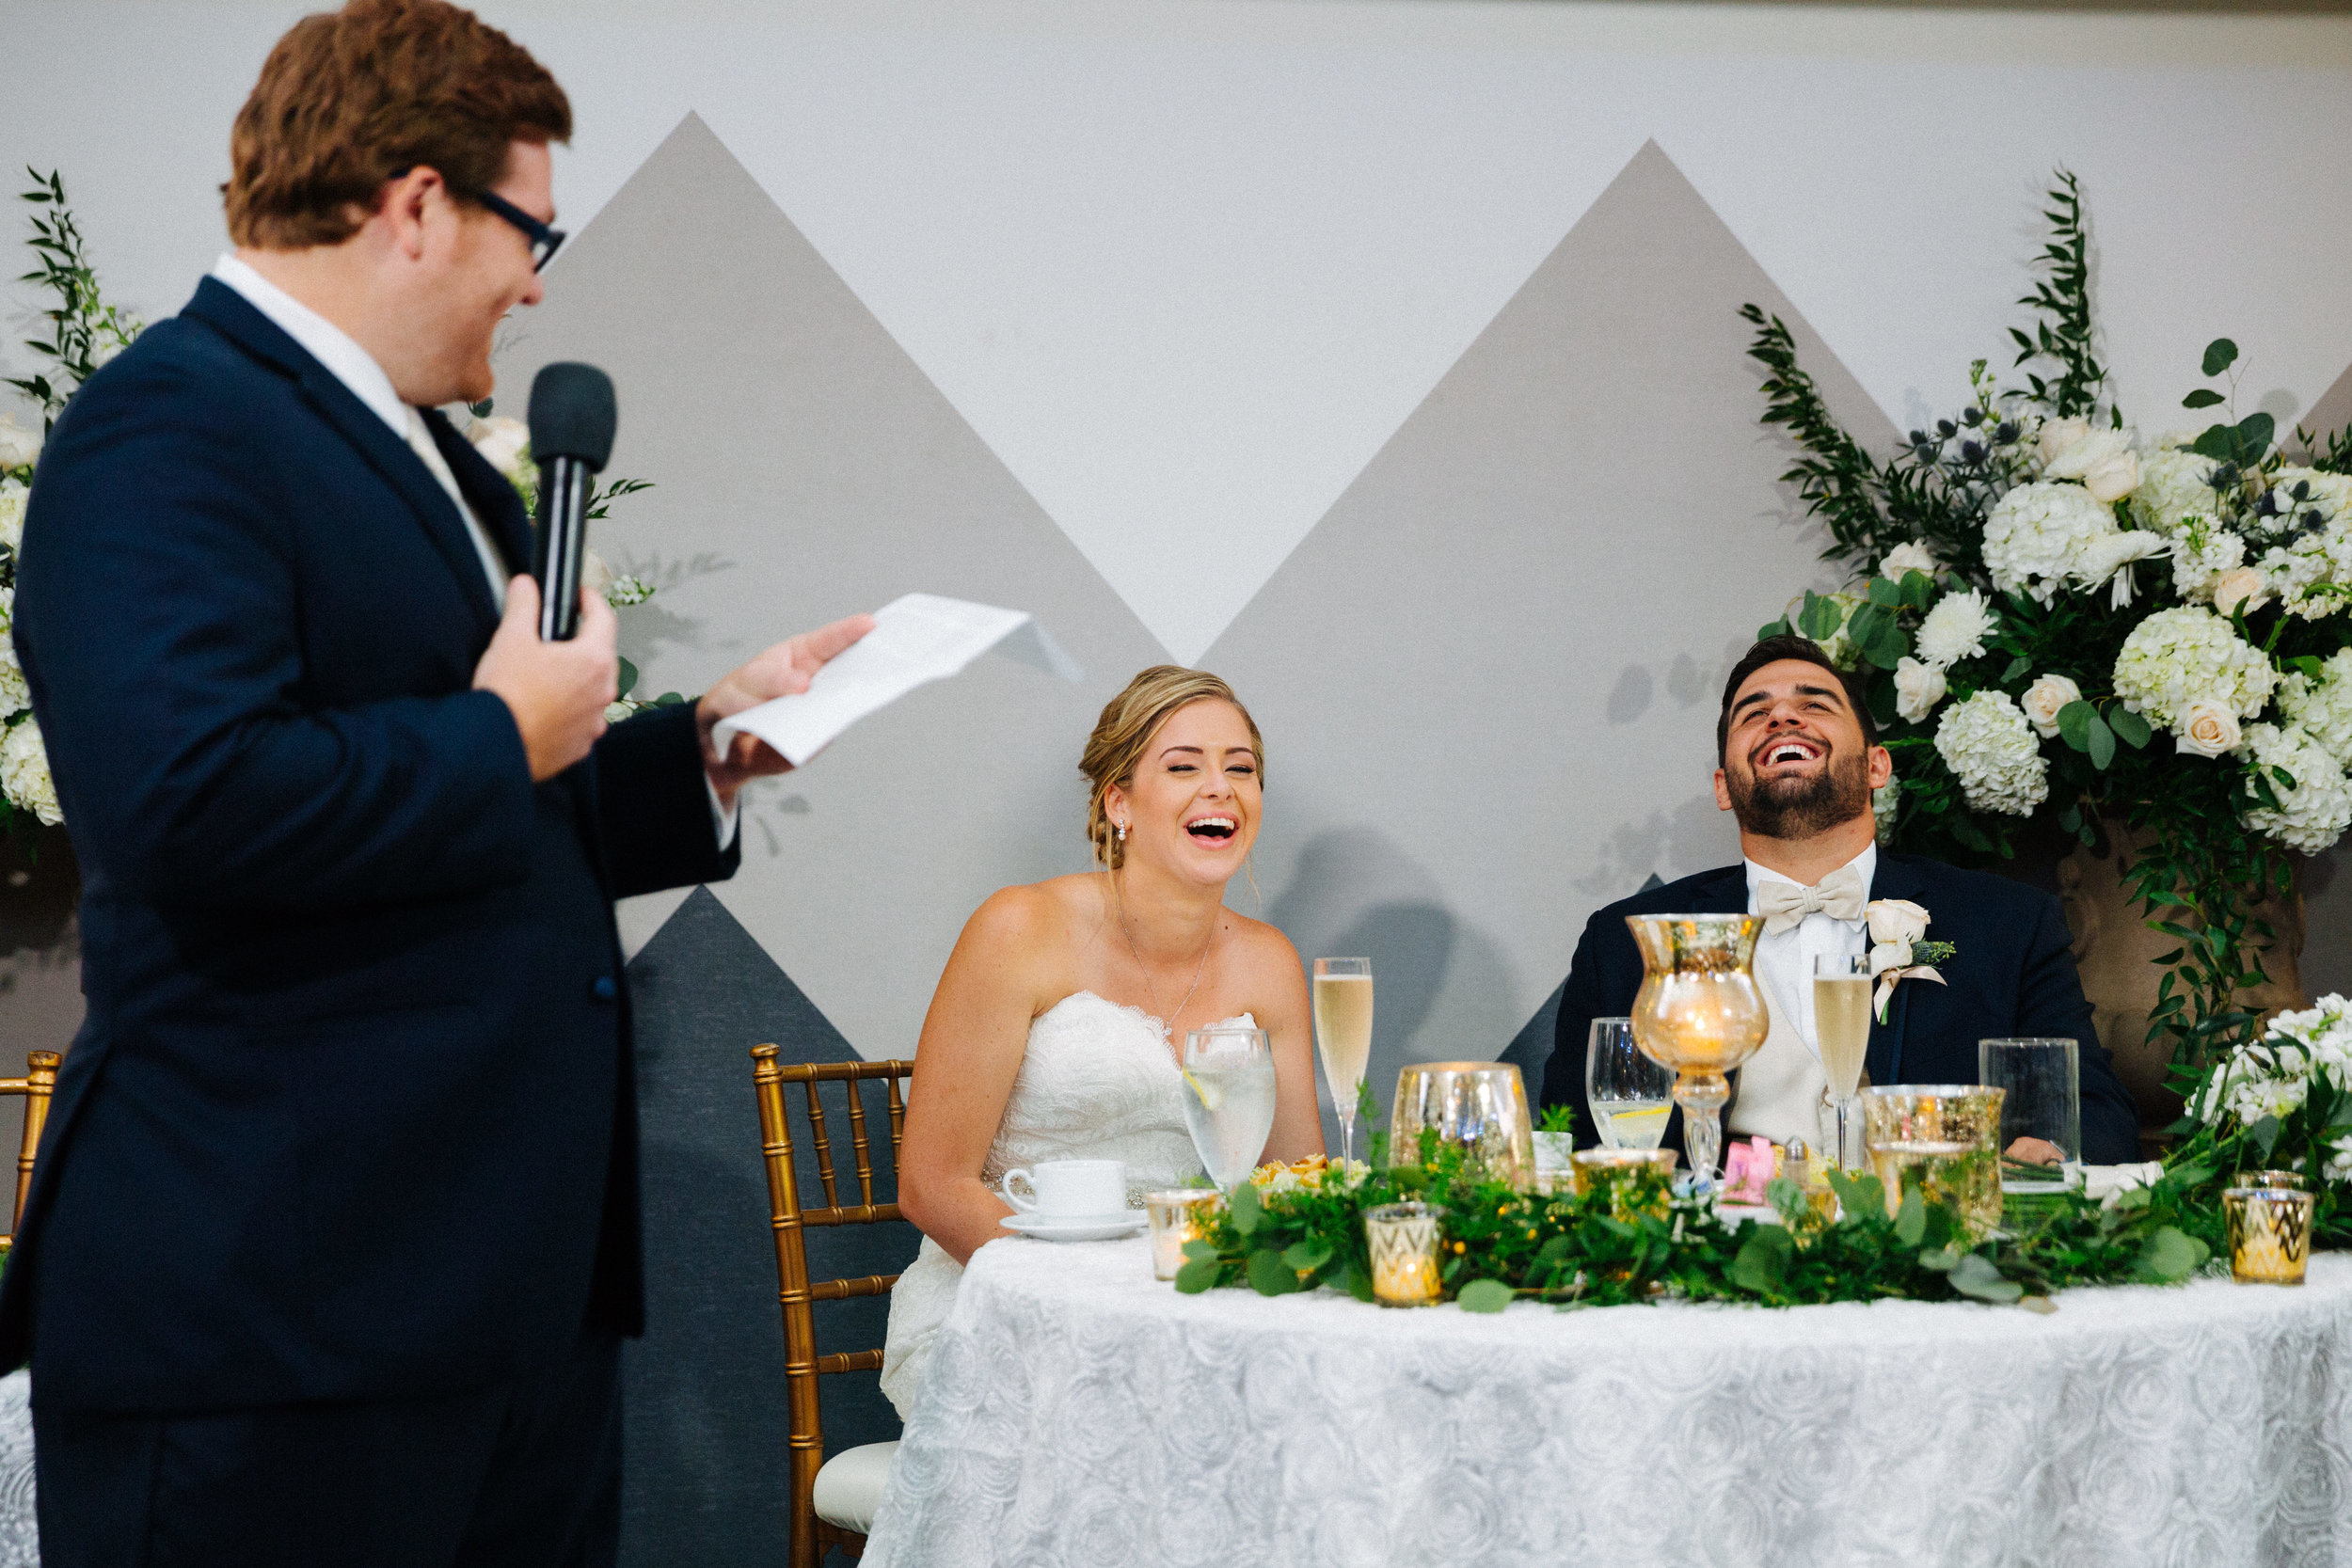 Ivan & Hannah - Reception - Jake & Katie Photography_216.jpg